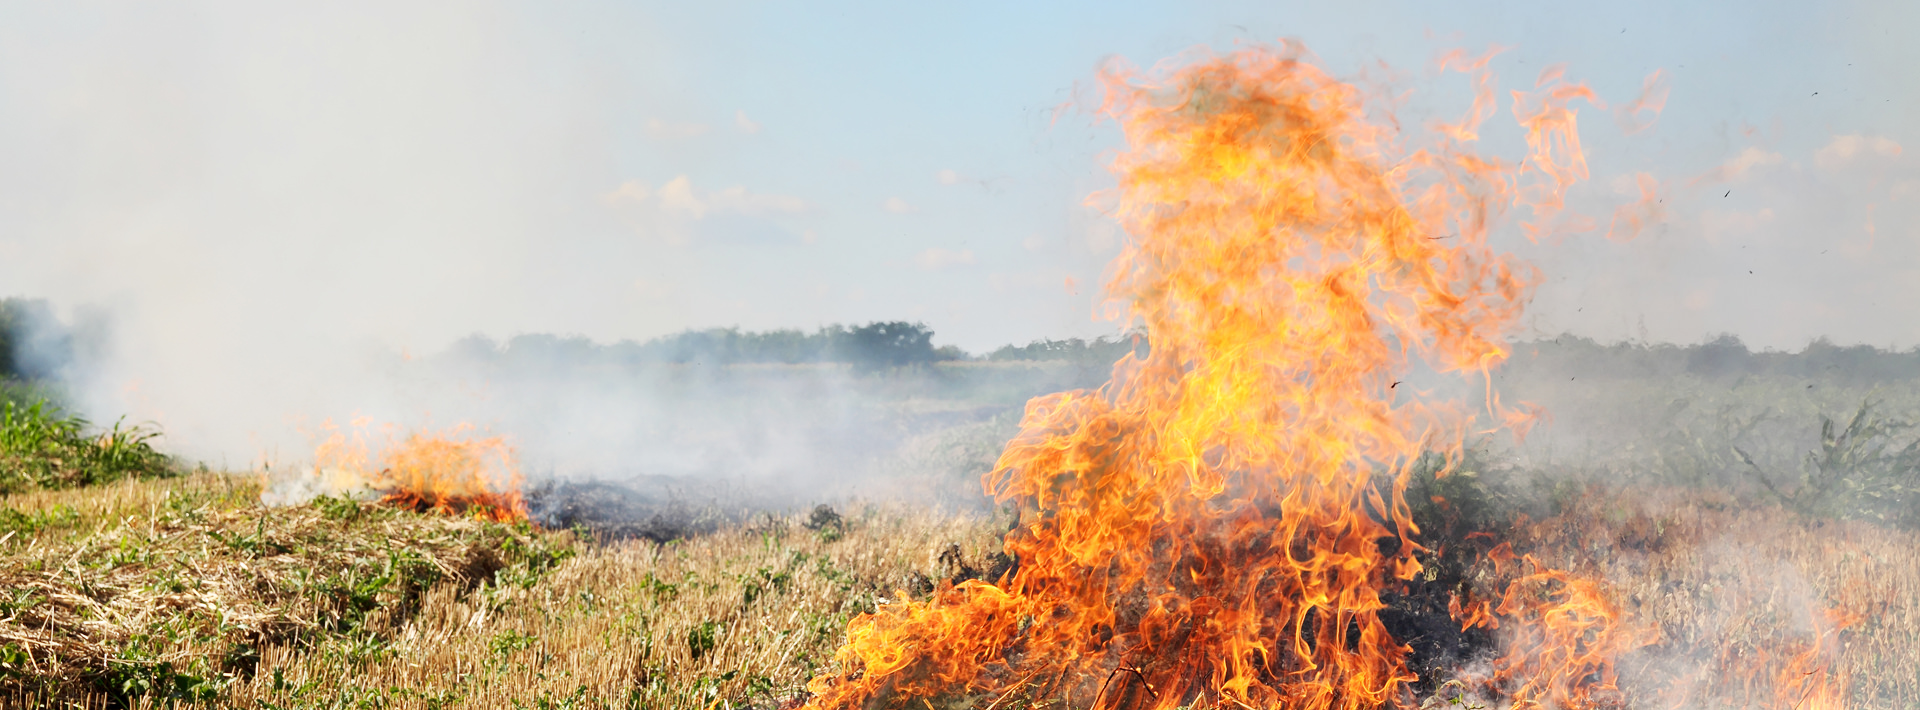 Image en-tête - Danger d'incendie